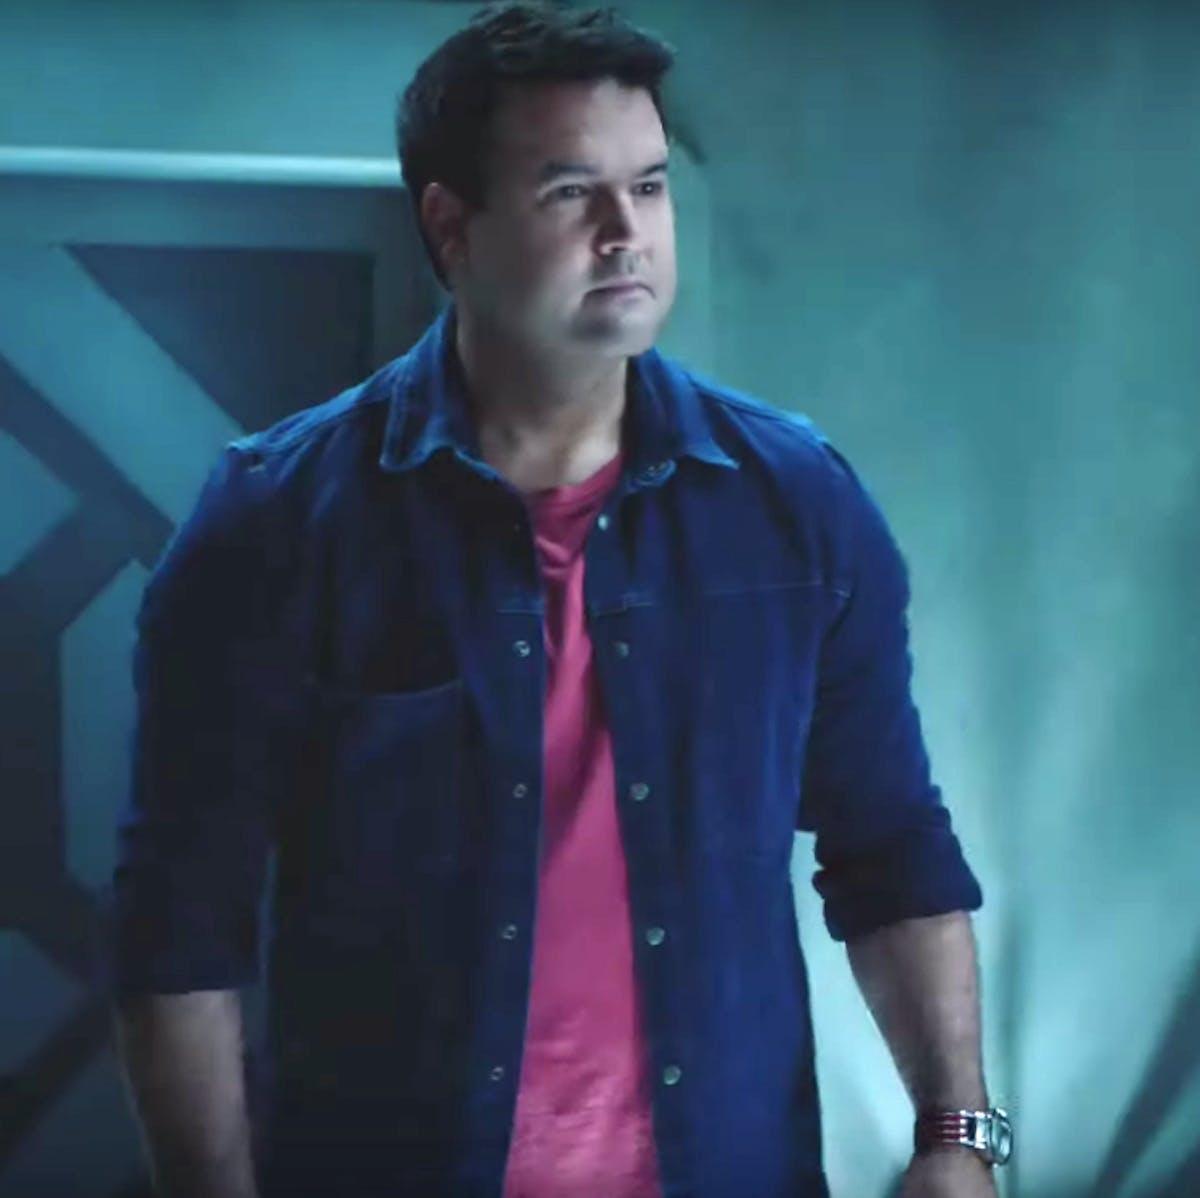 Power Rangers': Original 'Mighty Morphin' Star Returns in